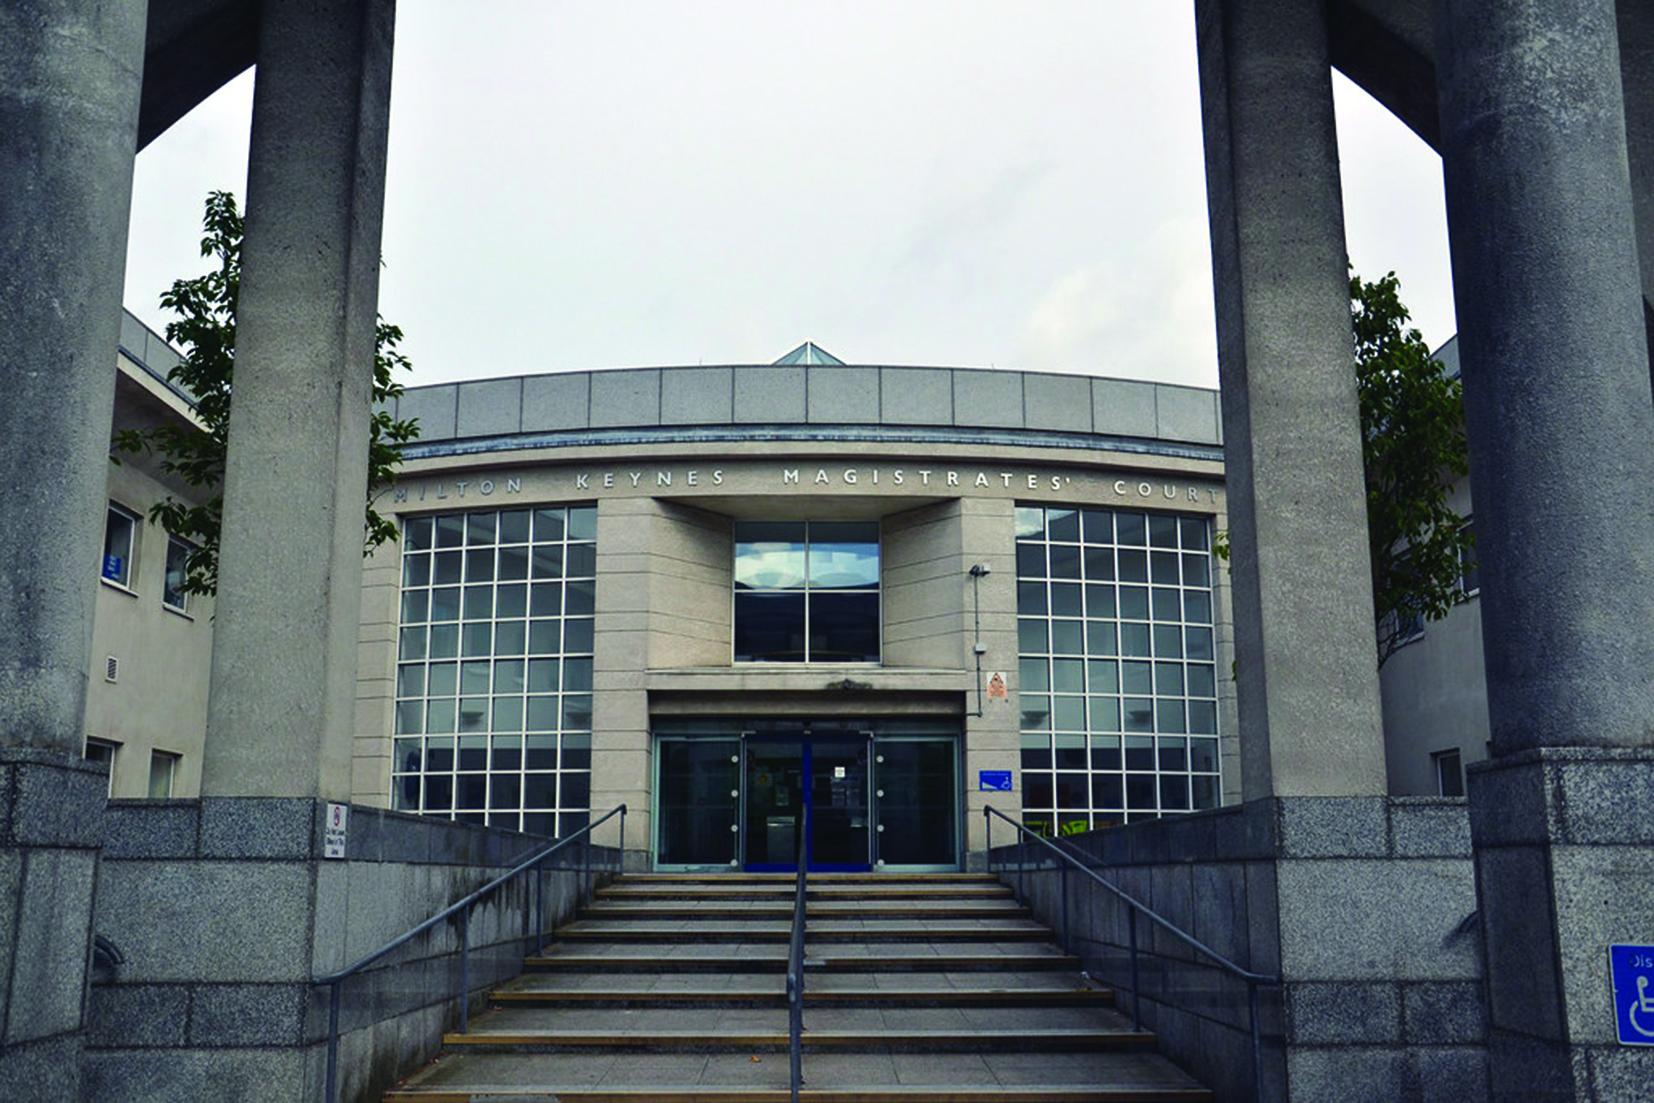 Milton Keynes Magistrates Court Open Morning Top Image